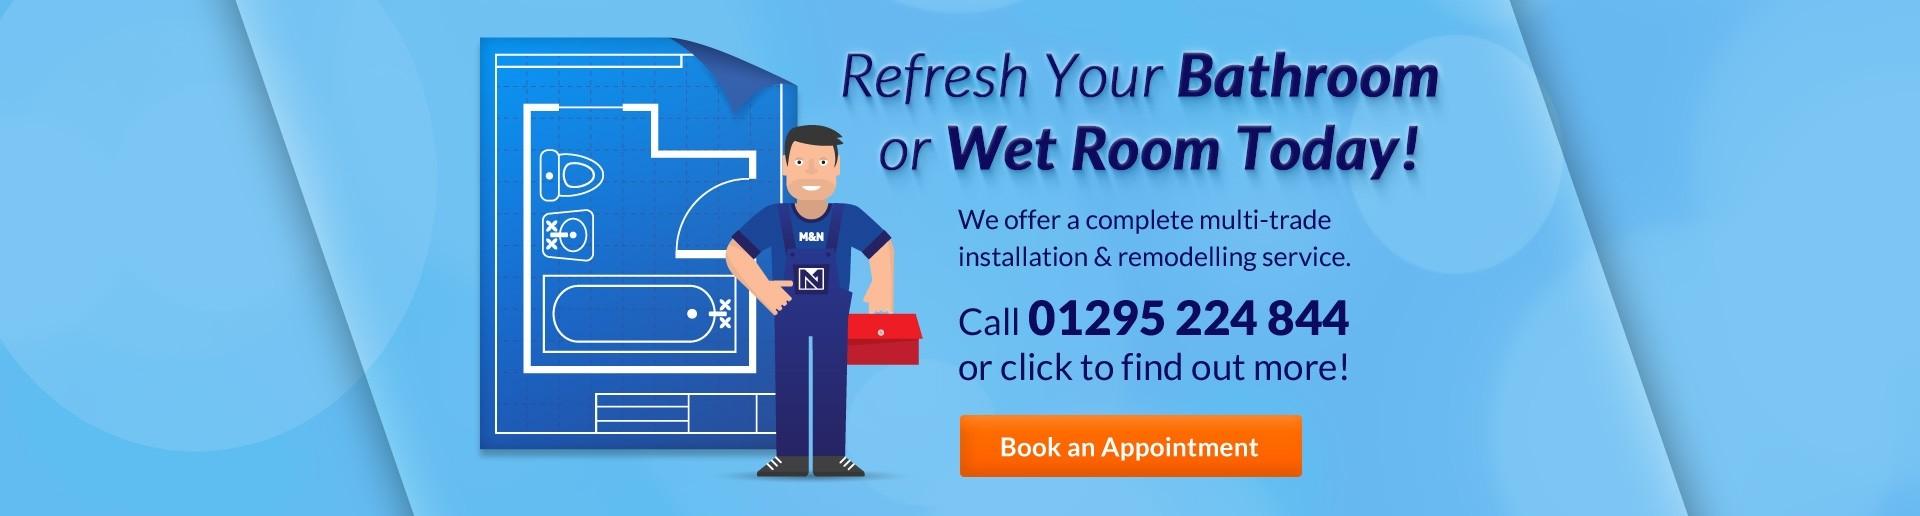 Refresh Your Bathroom or Wetroom